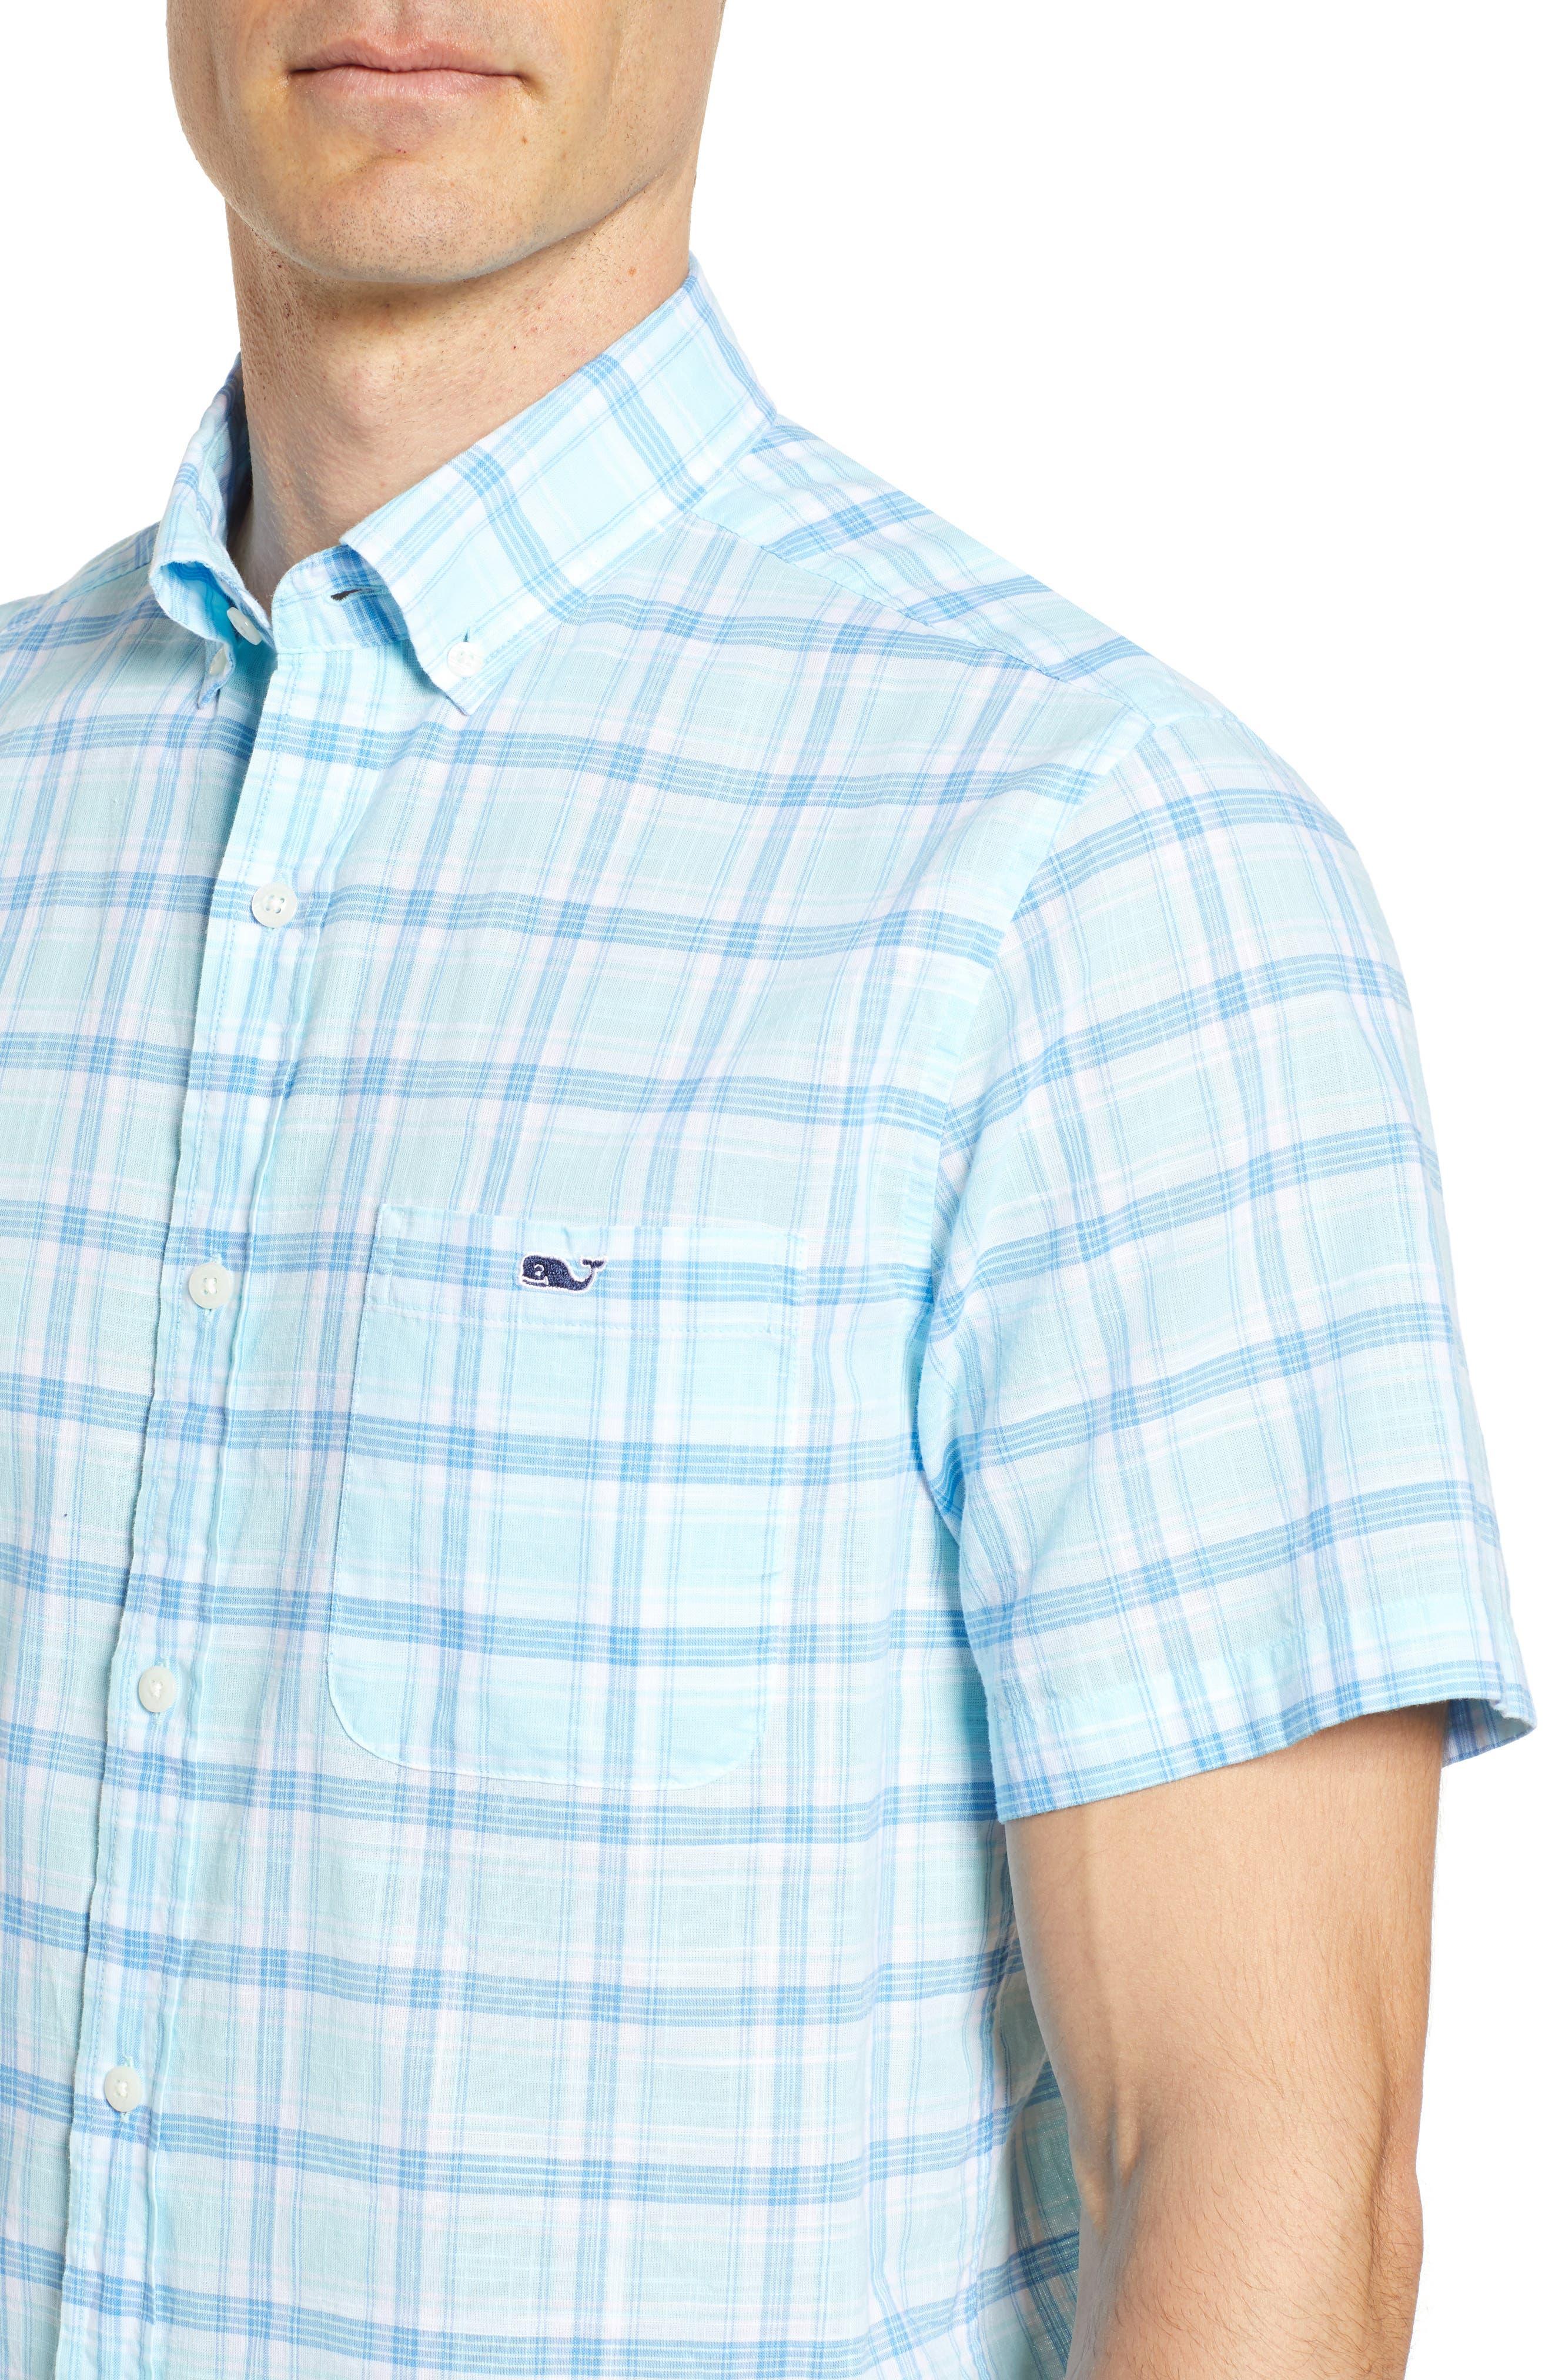 Pleasant Bay Classic Fit Plaid Sport Shirt,                             Alternate thumbnail 2, color,                             Pool Side